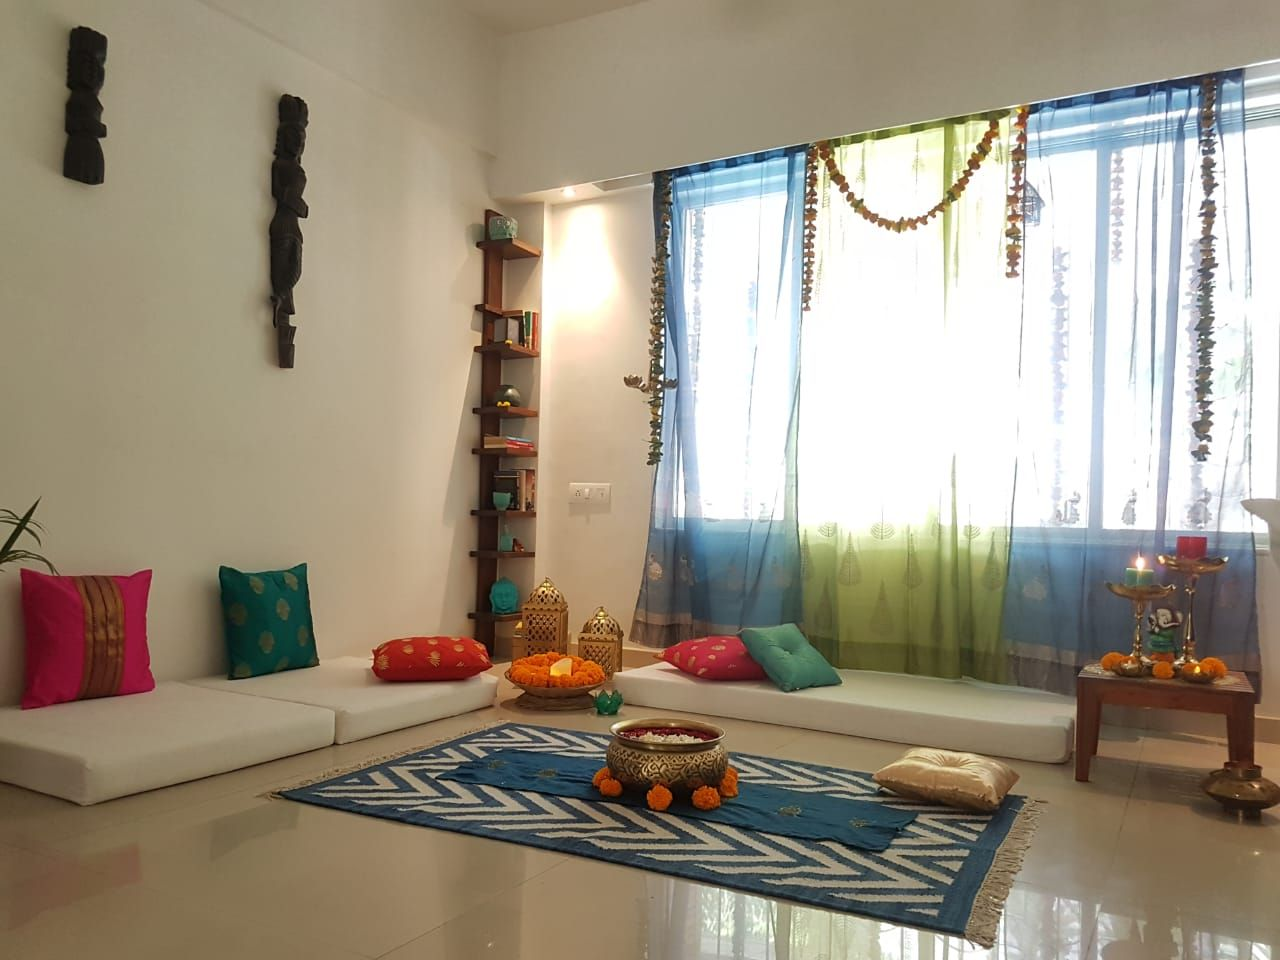 kajal tyagi home tour thekeybunch art interiors home decor rh pinterest com